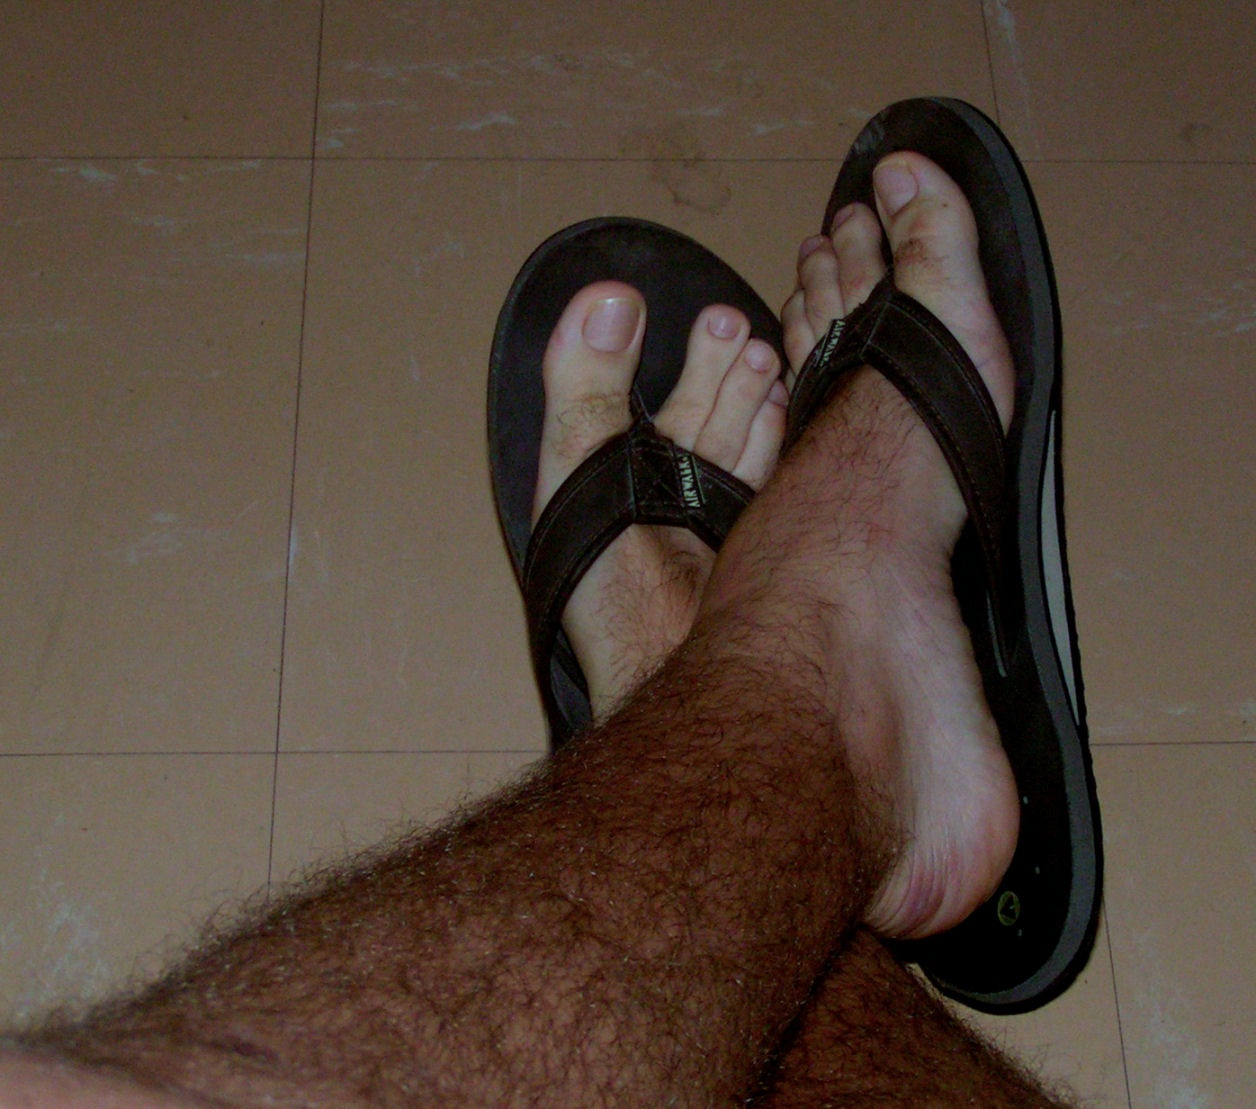 Hairy Feet 54